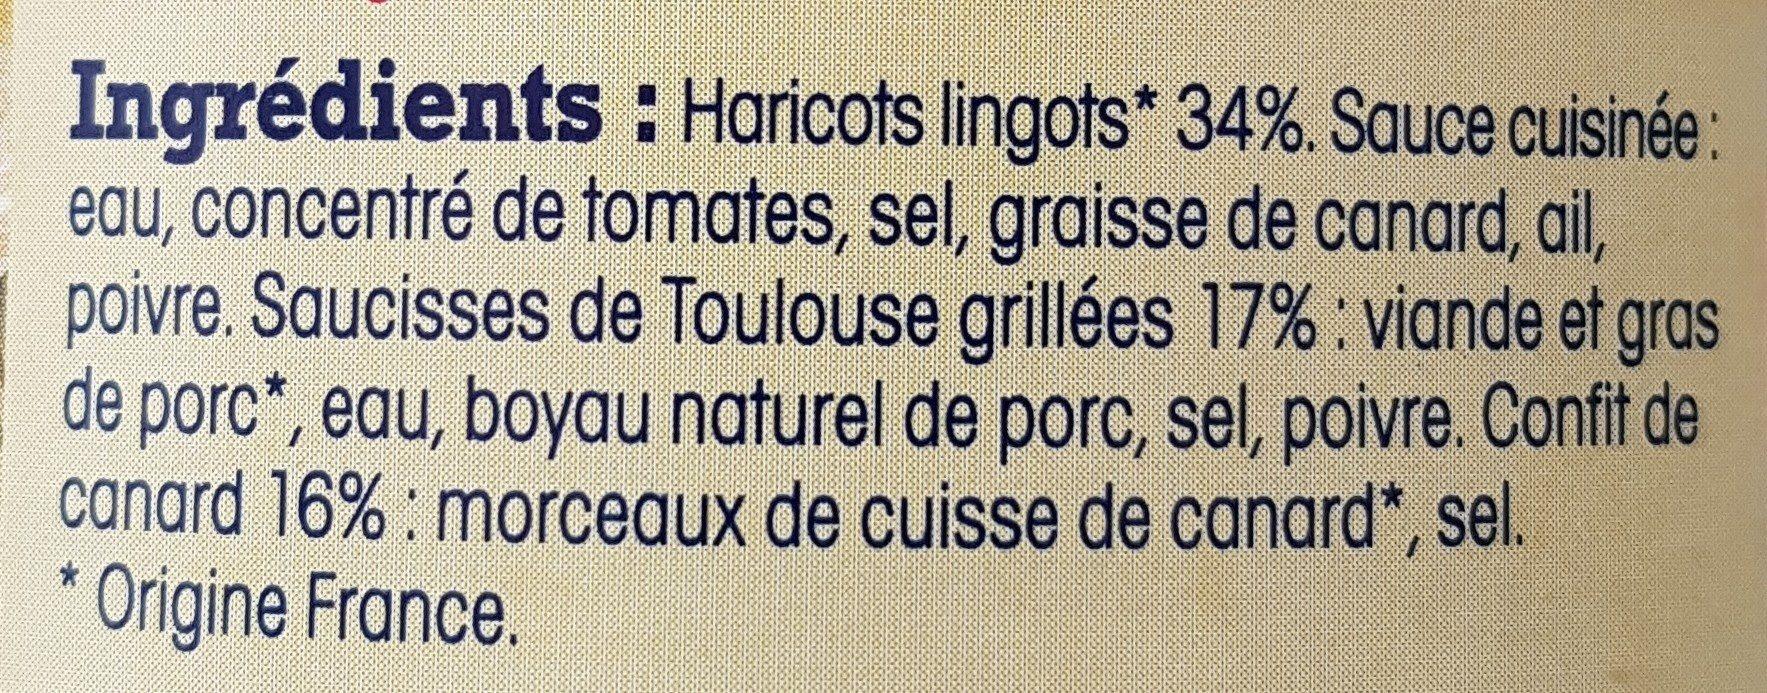 Cassoulet de Castelnaudary au confit de canard - Ingrediënten - fr